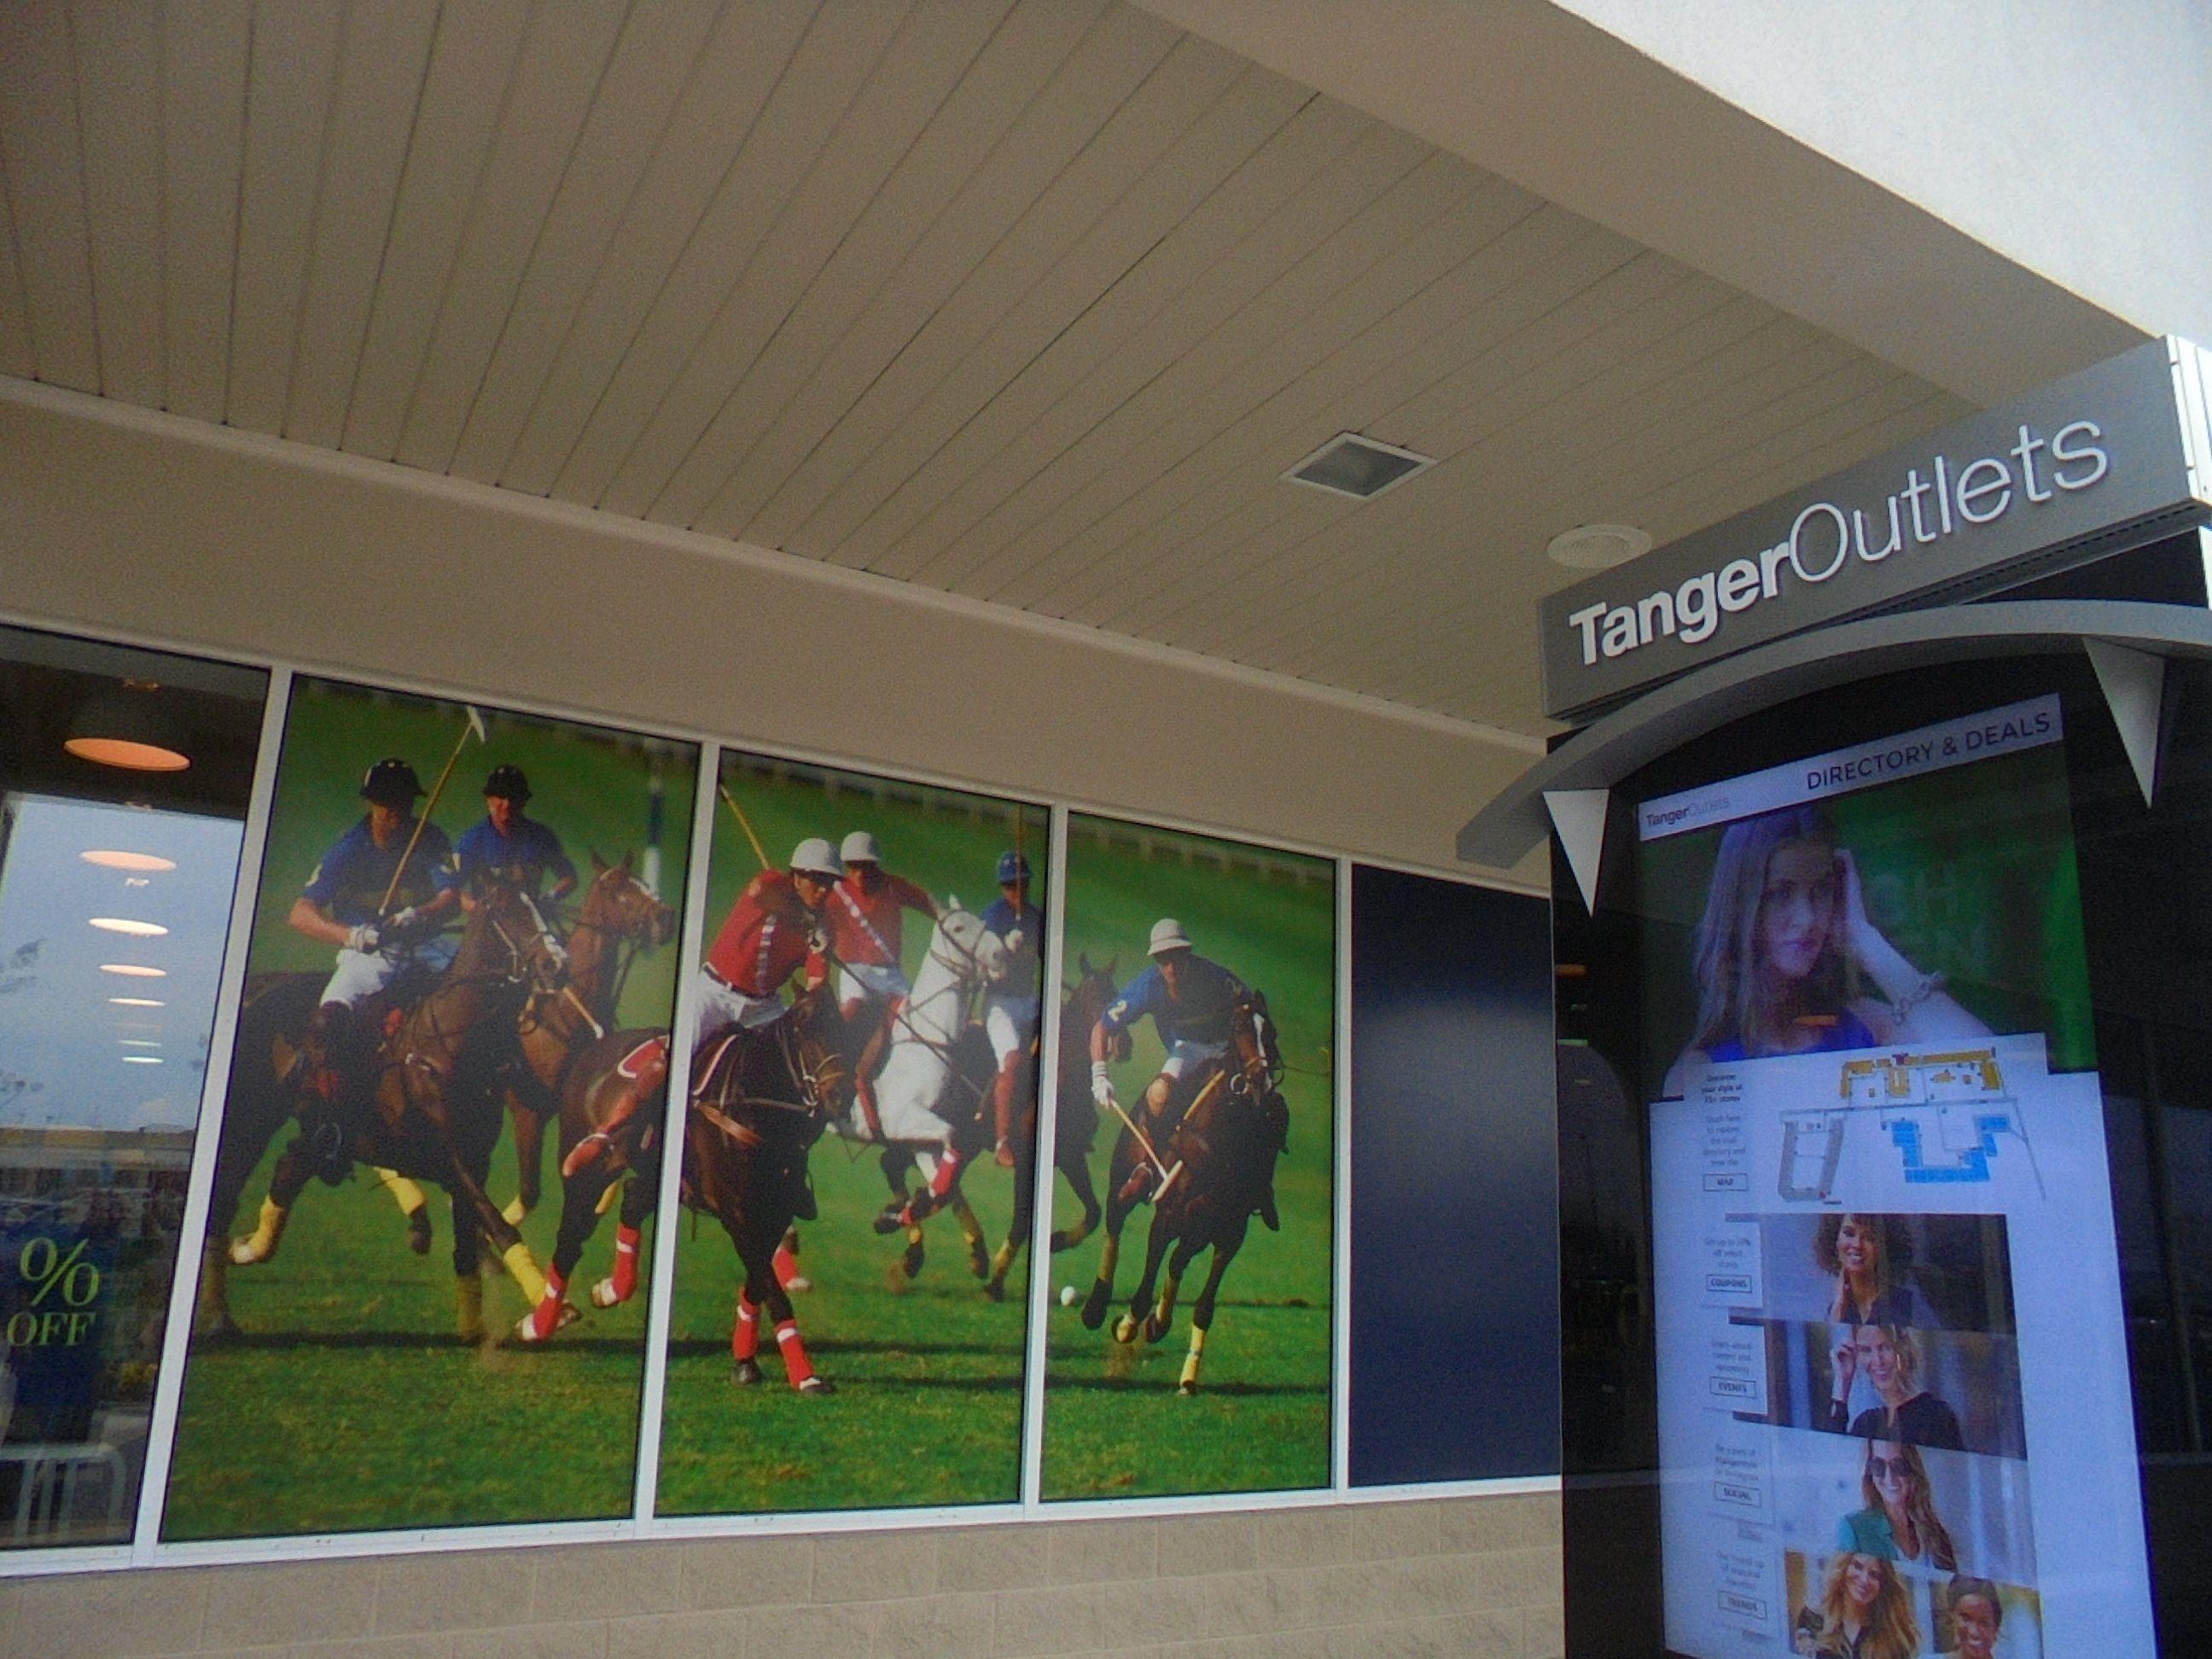 #RalphLauren #store @ #TangerOutlet in #RehobothBeachDelaware - http://www.drewrynewsnetwork.com